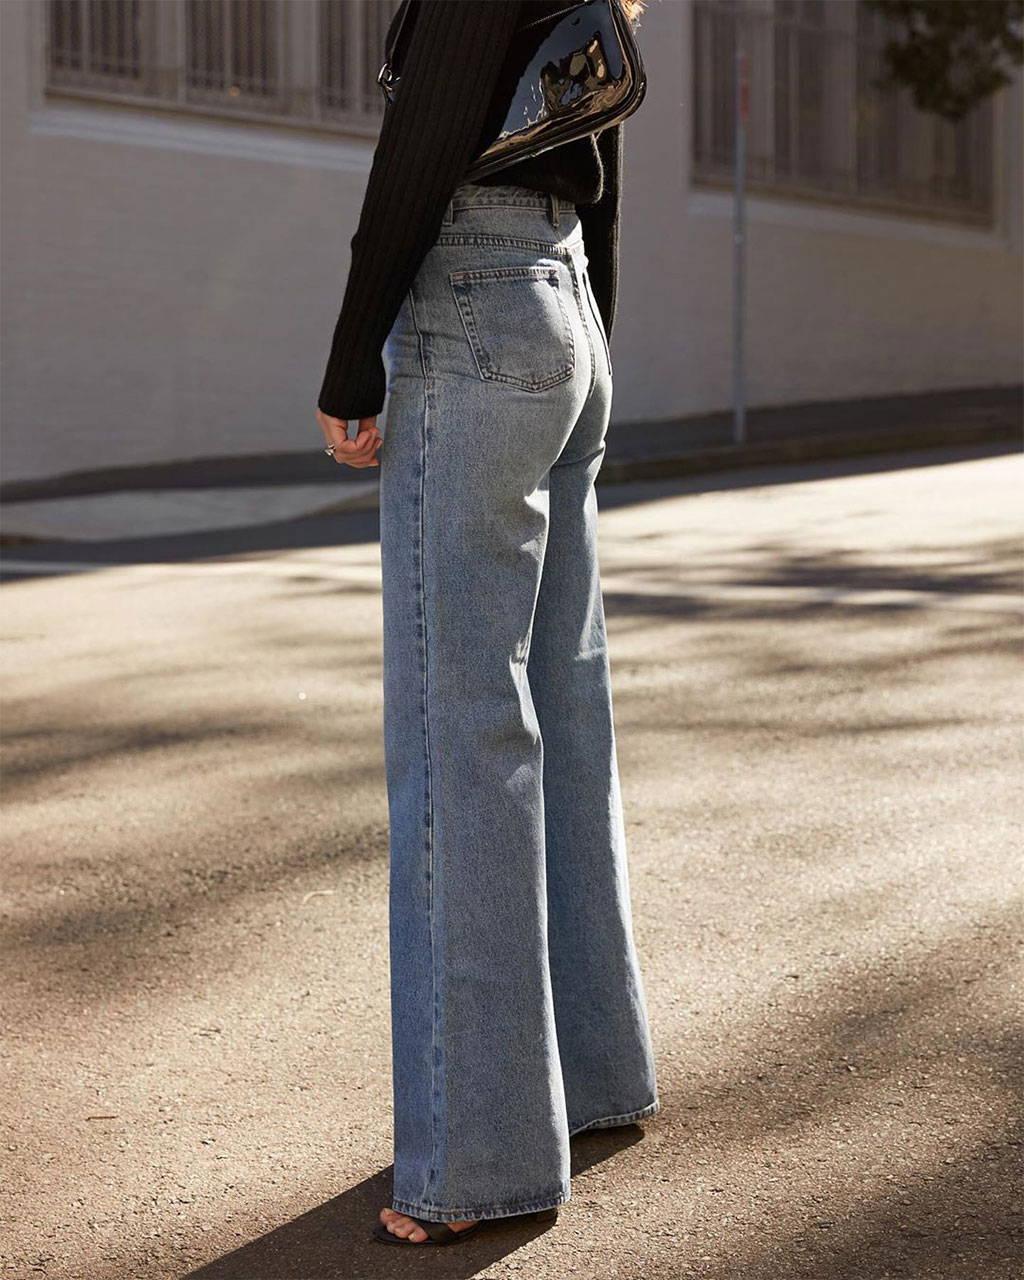 @harperandharley wearing Georgia Alice jeans.